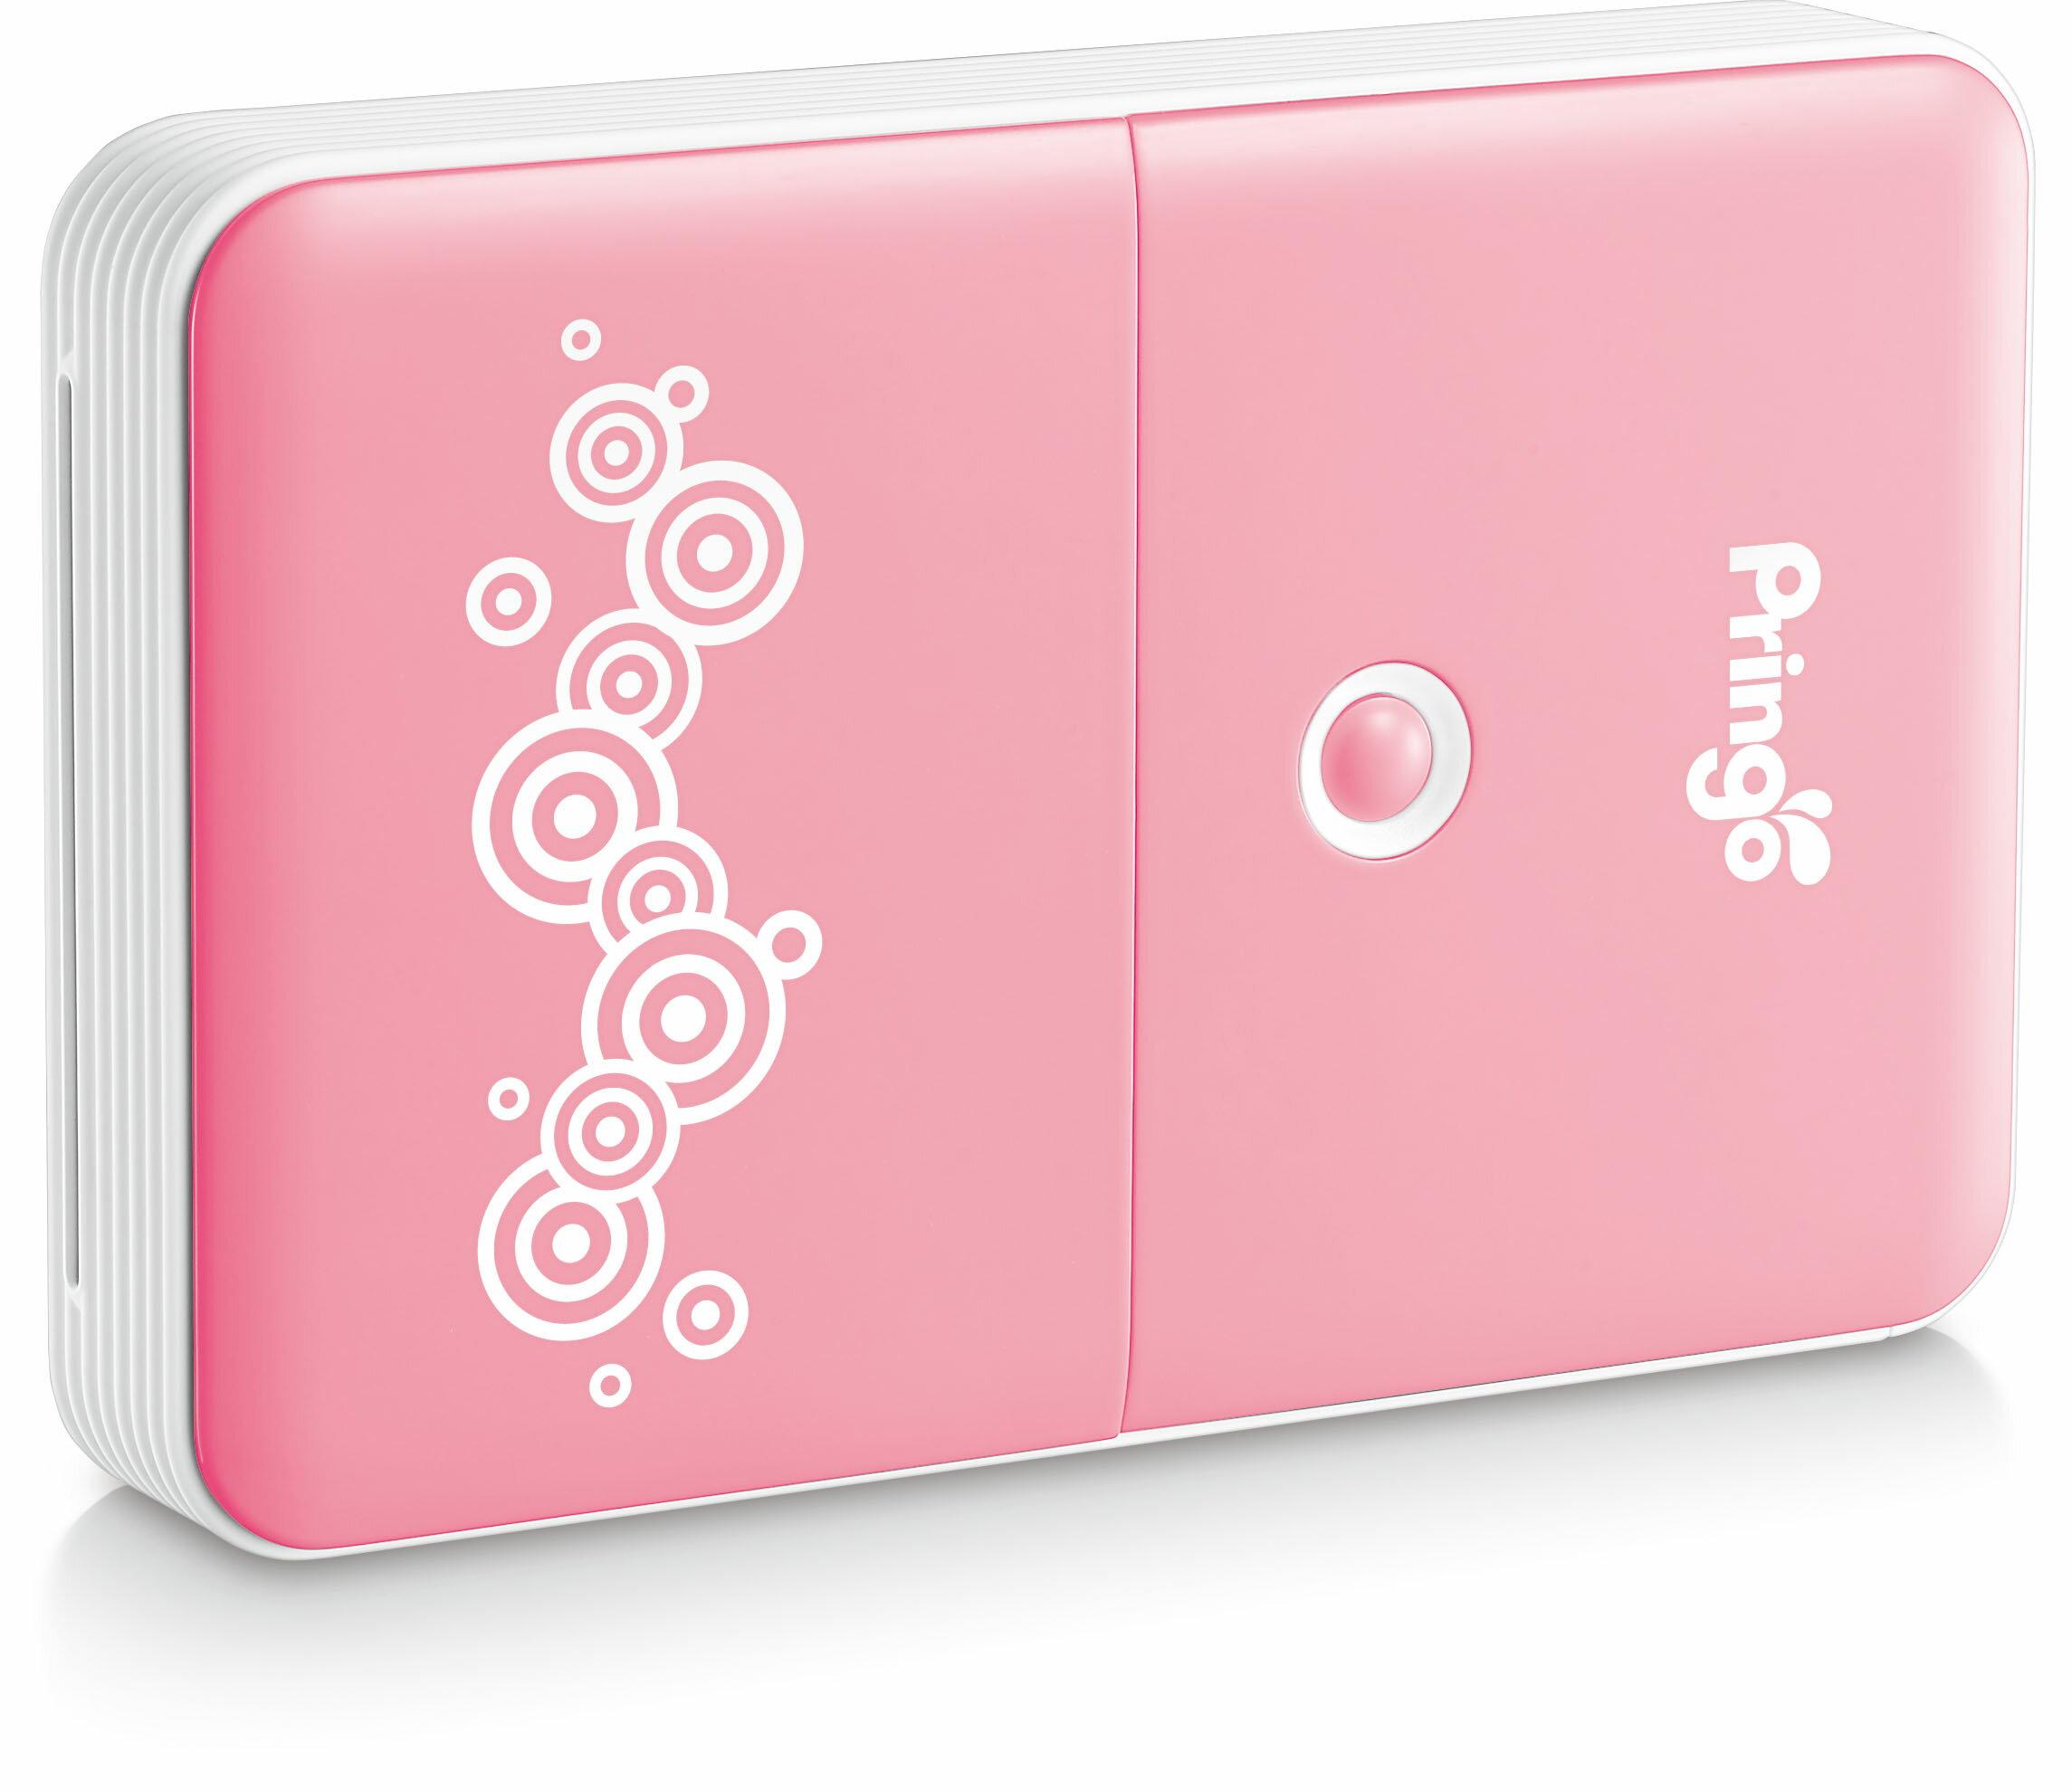 HITI PRINGO P231 隨身行動相片印表機 單機 智慧型手機用